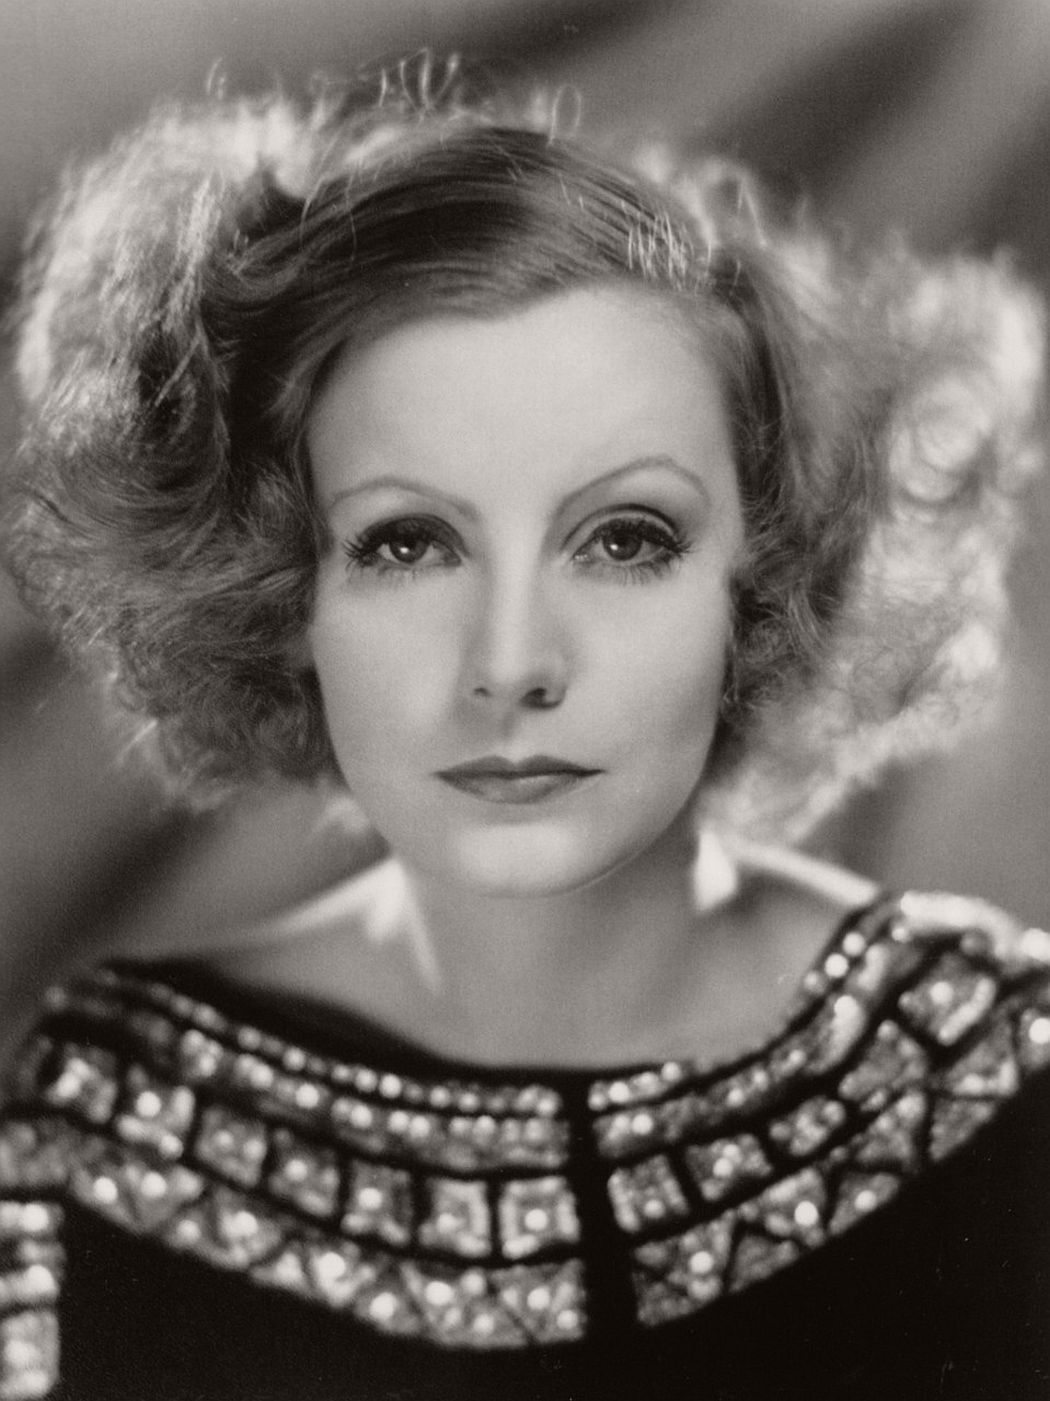 vintage-greta-garbo-portraits-1920s-1930s-12.jpg